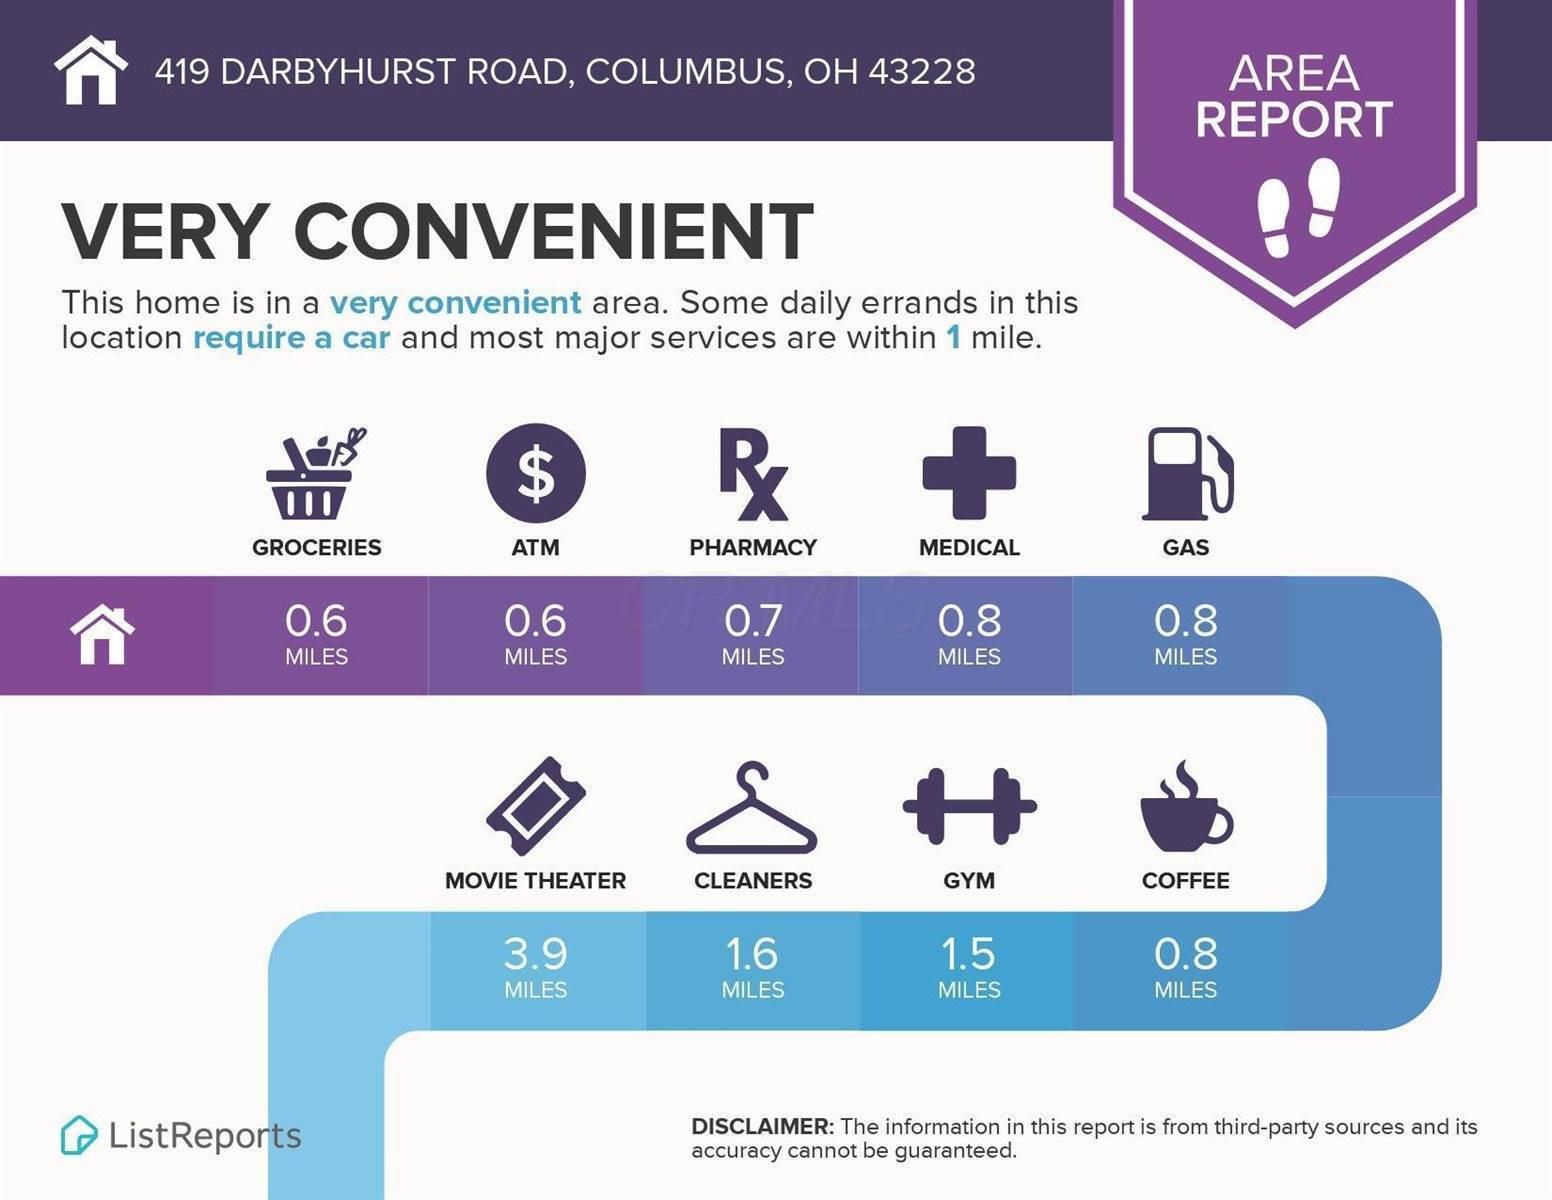 419 Darbyhurst Road, Columbus, OH 43228